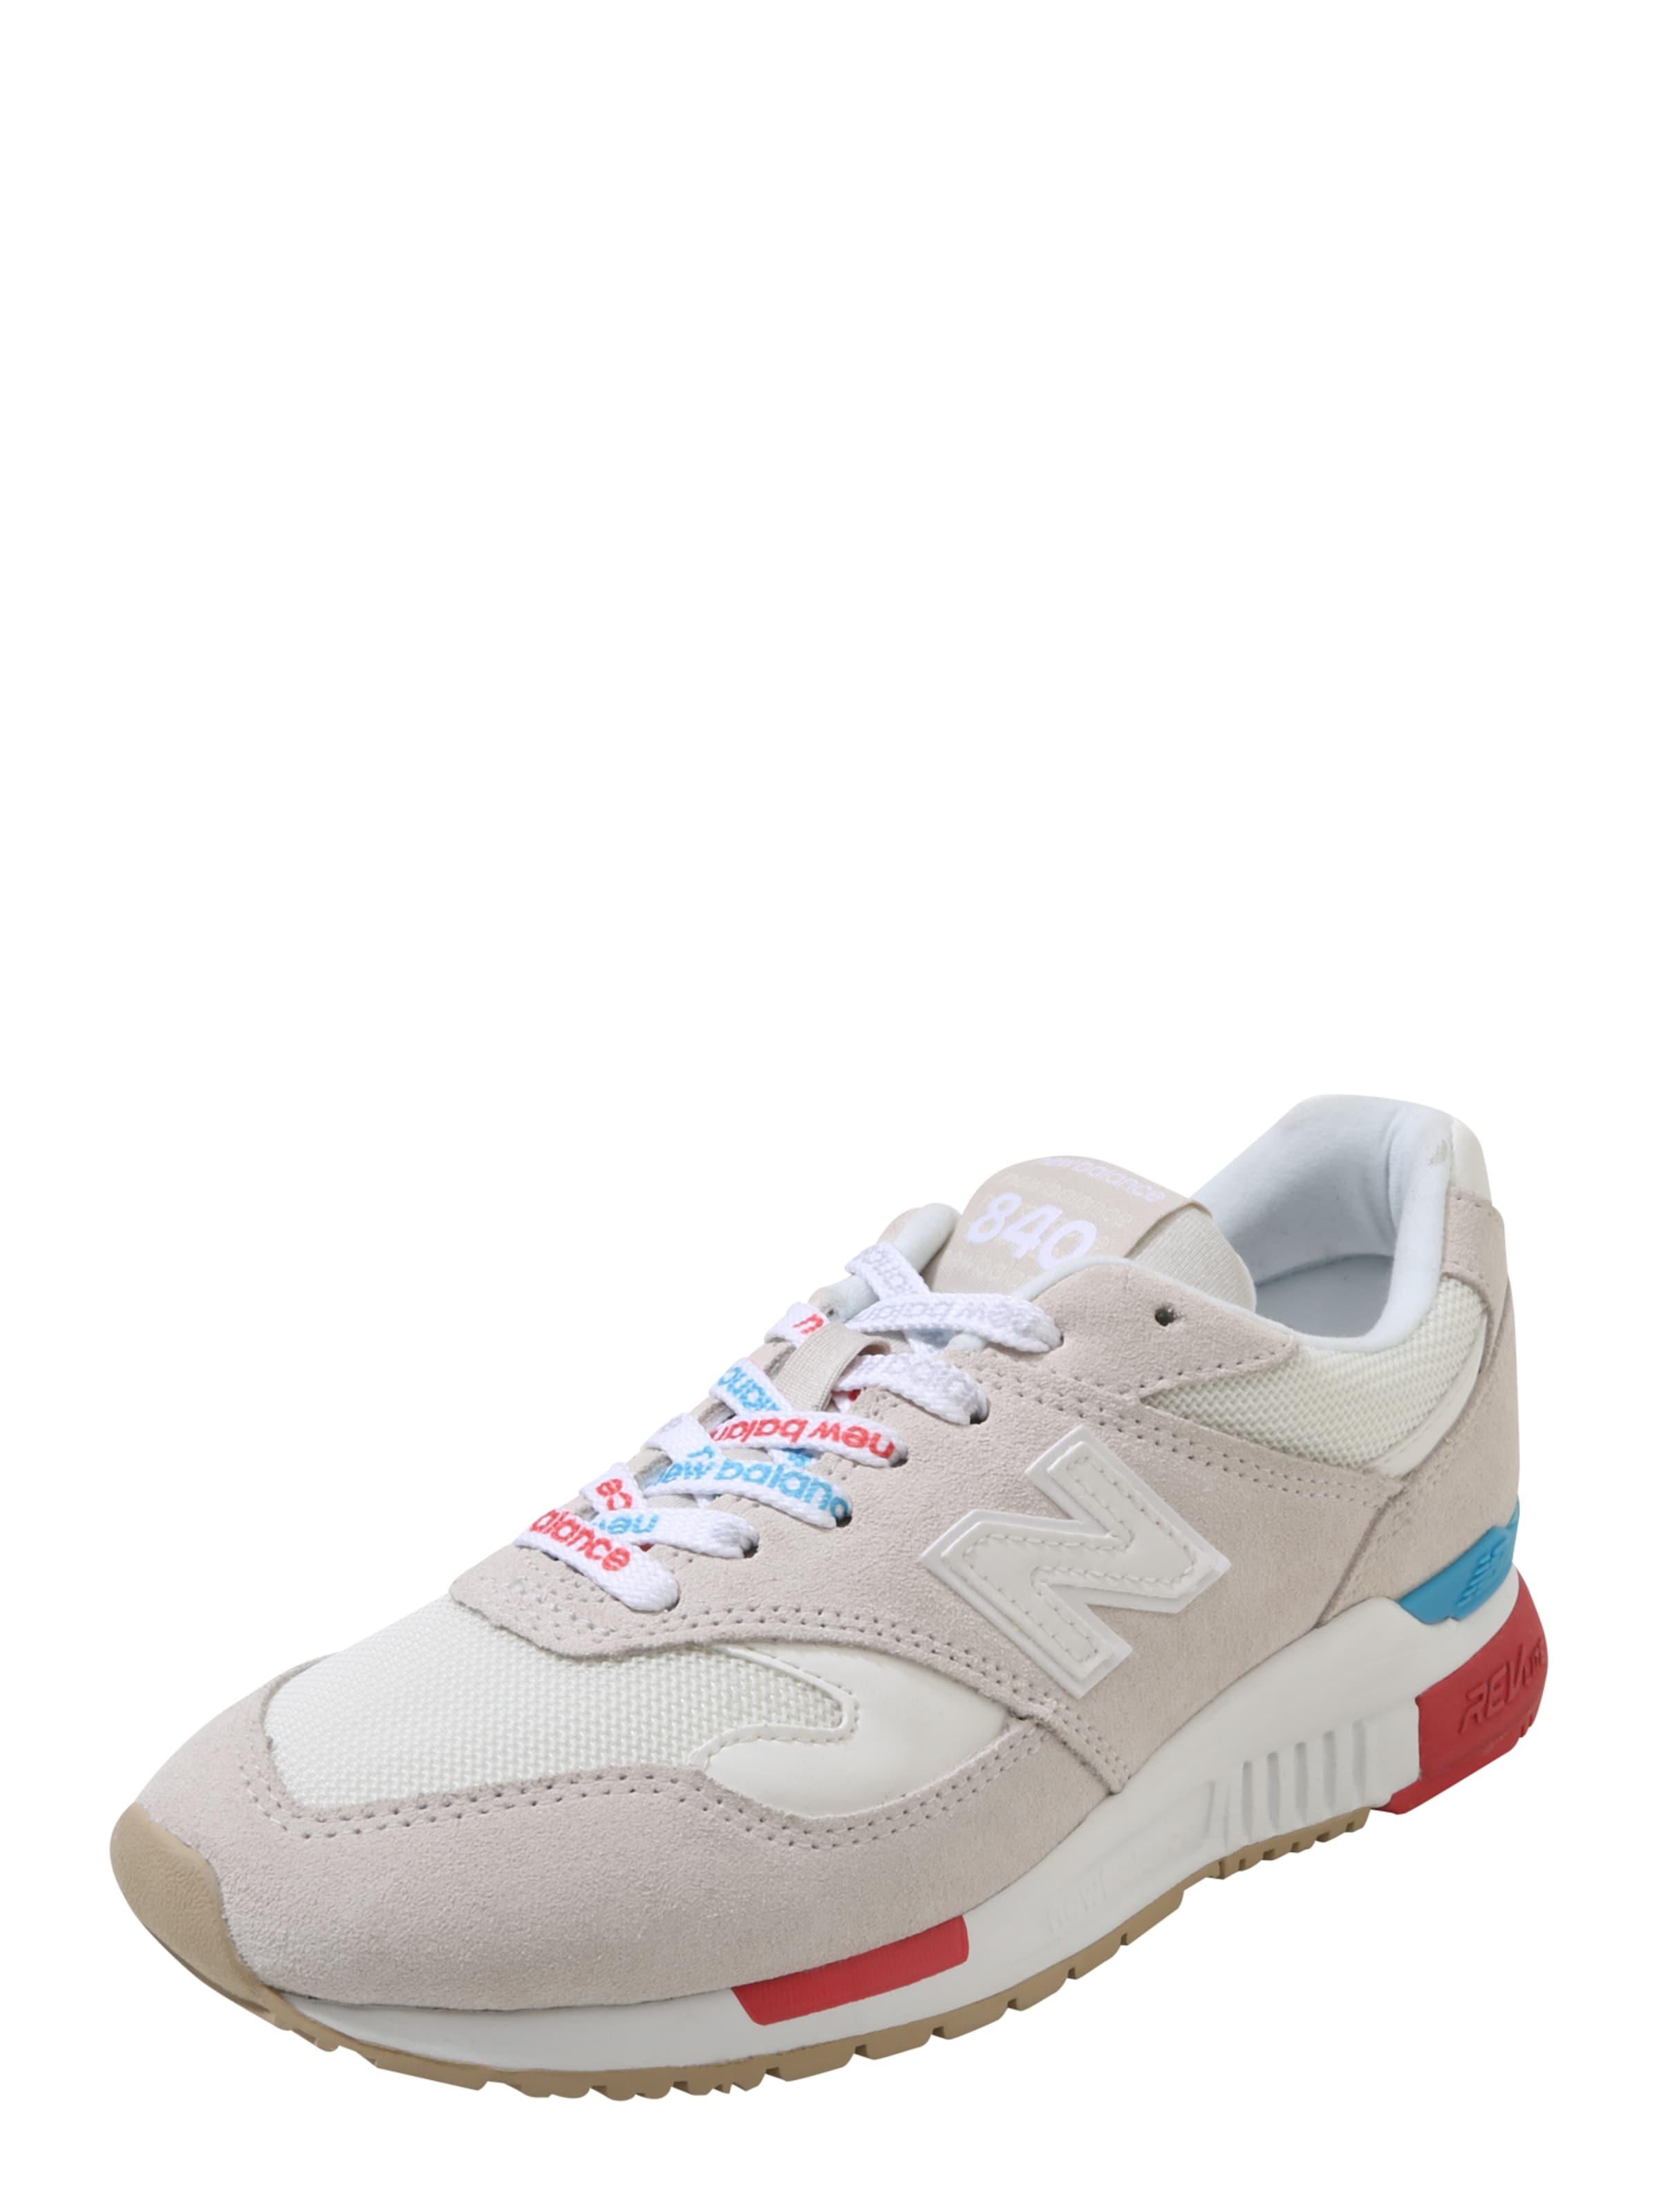 New Offwhite 'wl840' In HellblauGrau Sneaker Balance Rot w0nPk8O